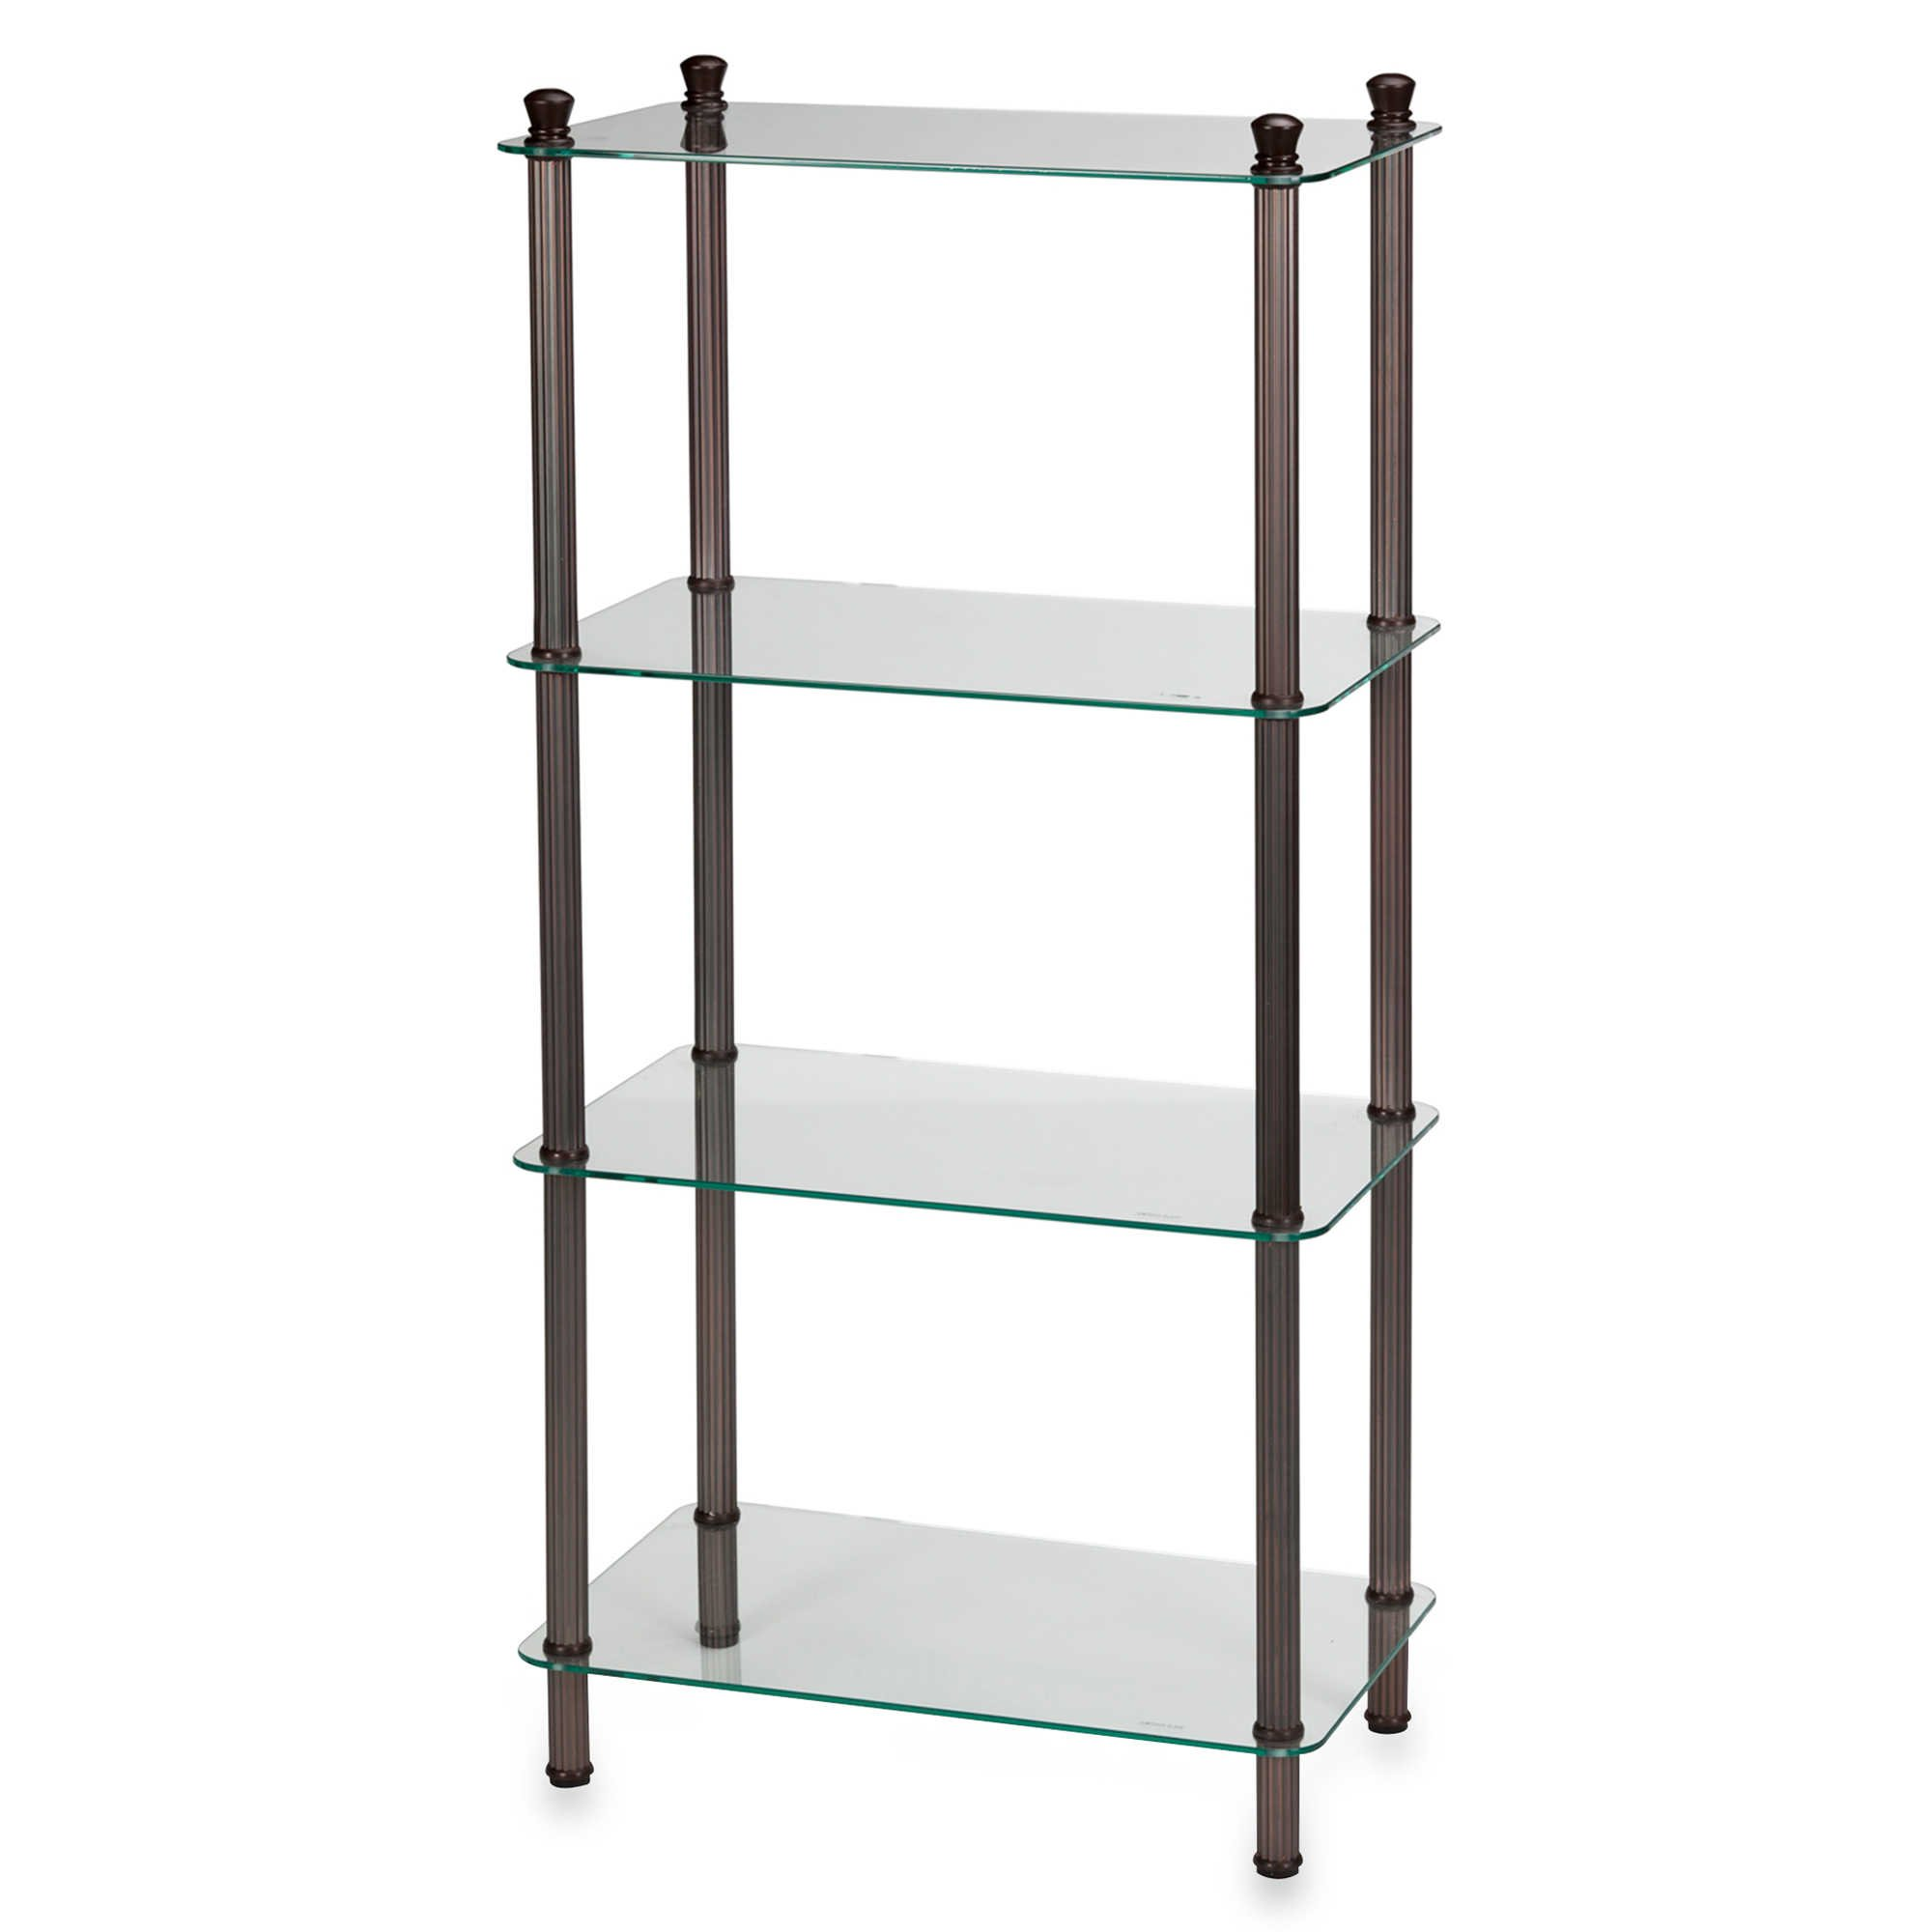 Bathroom Shelf in Oil Rubbed Bronze Steel / Tempered Glass 4-Shelf Wide Tower - 20'' L x 12'' W x 42'' W